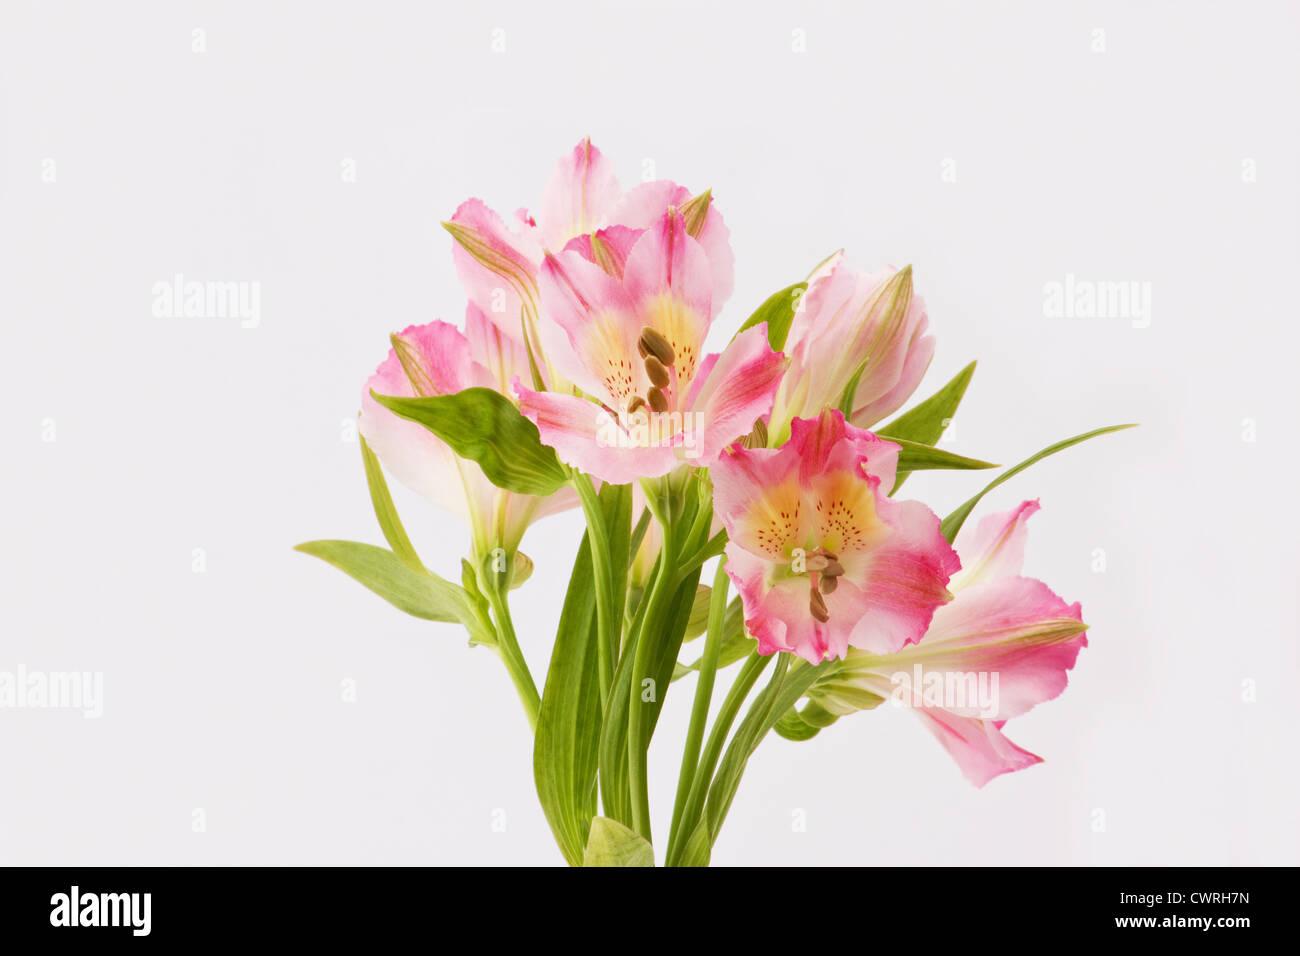 Pink freesia flowers on white background stock photo 50305577 alamy pink freesia flowers on white background mightylinksfo